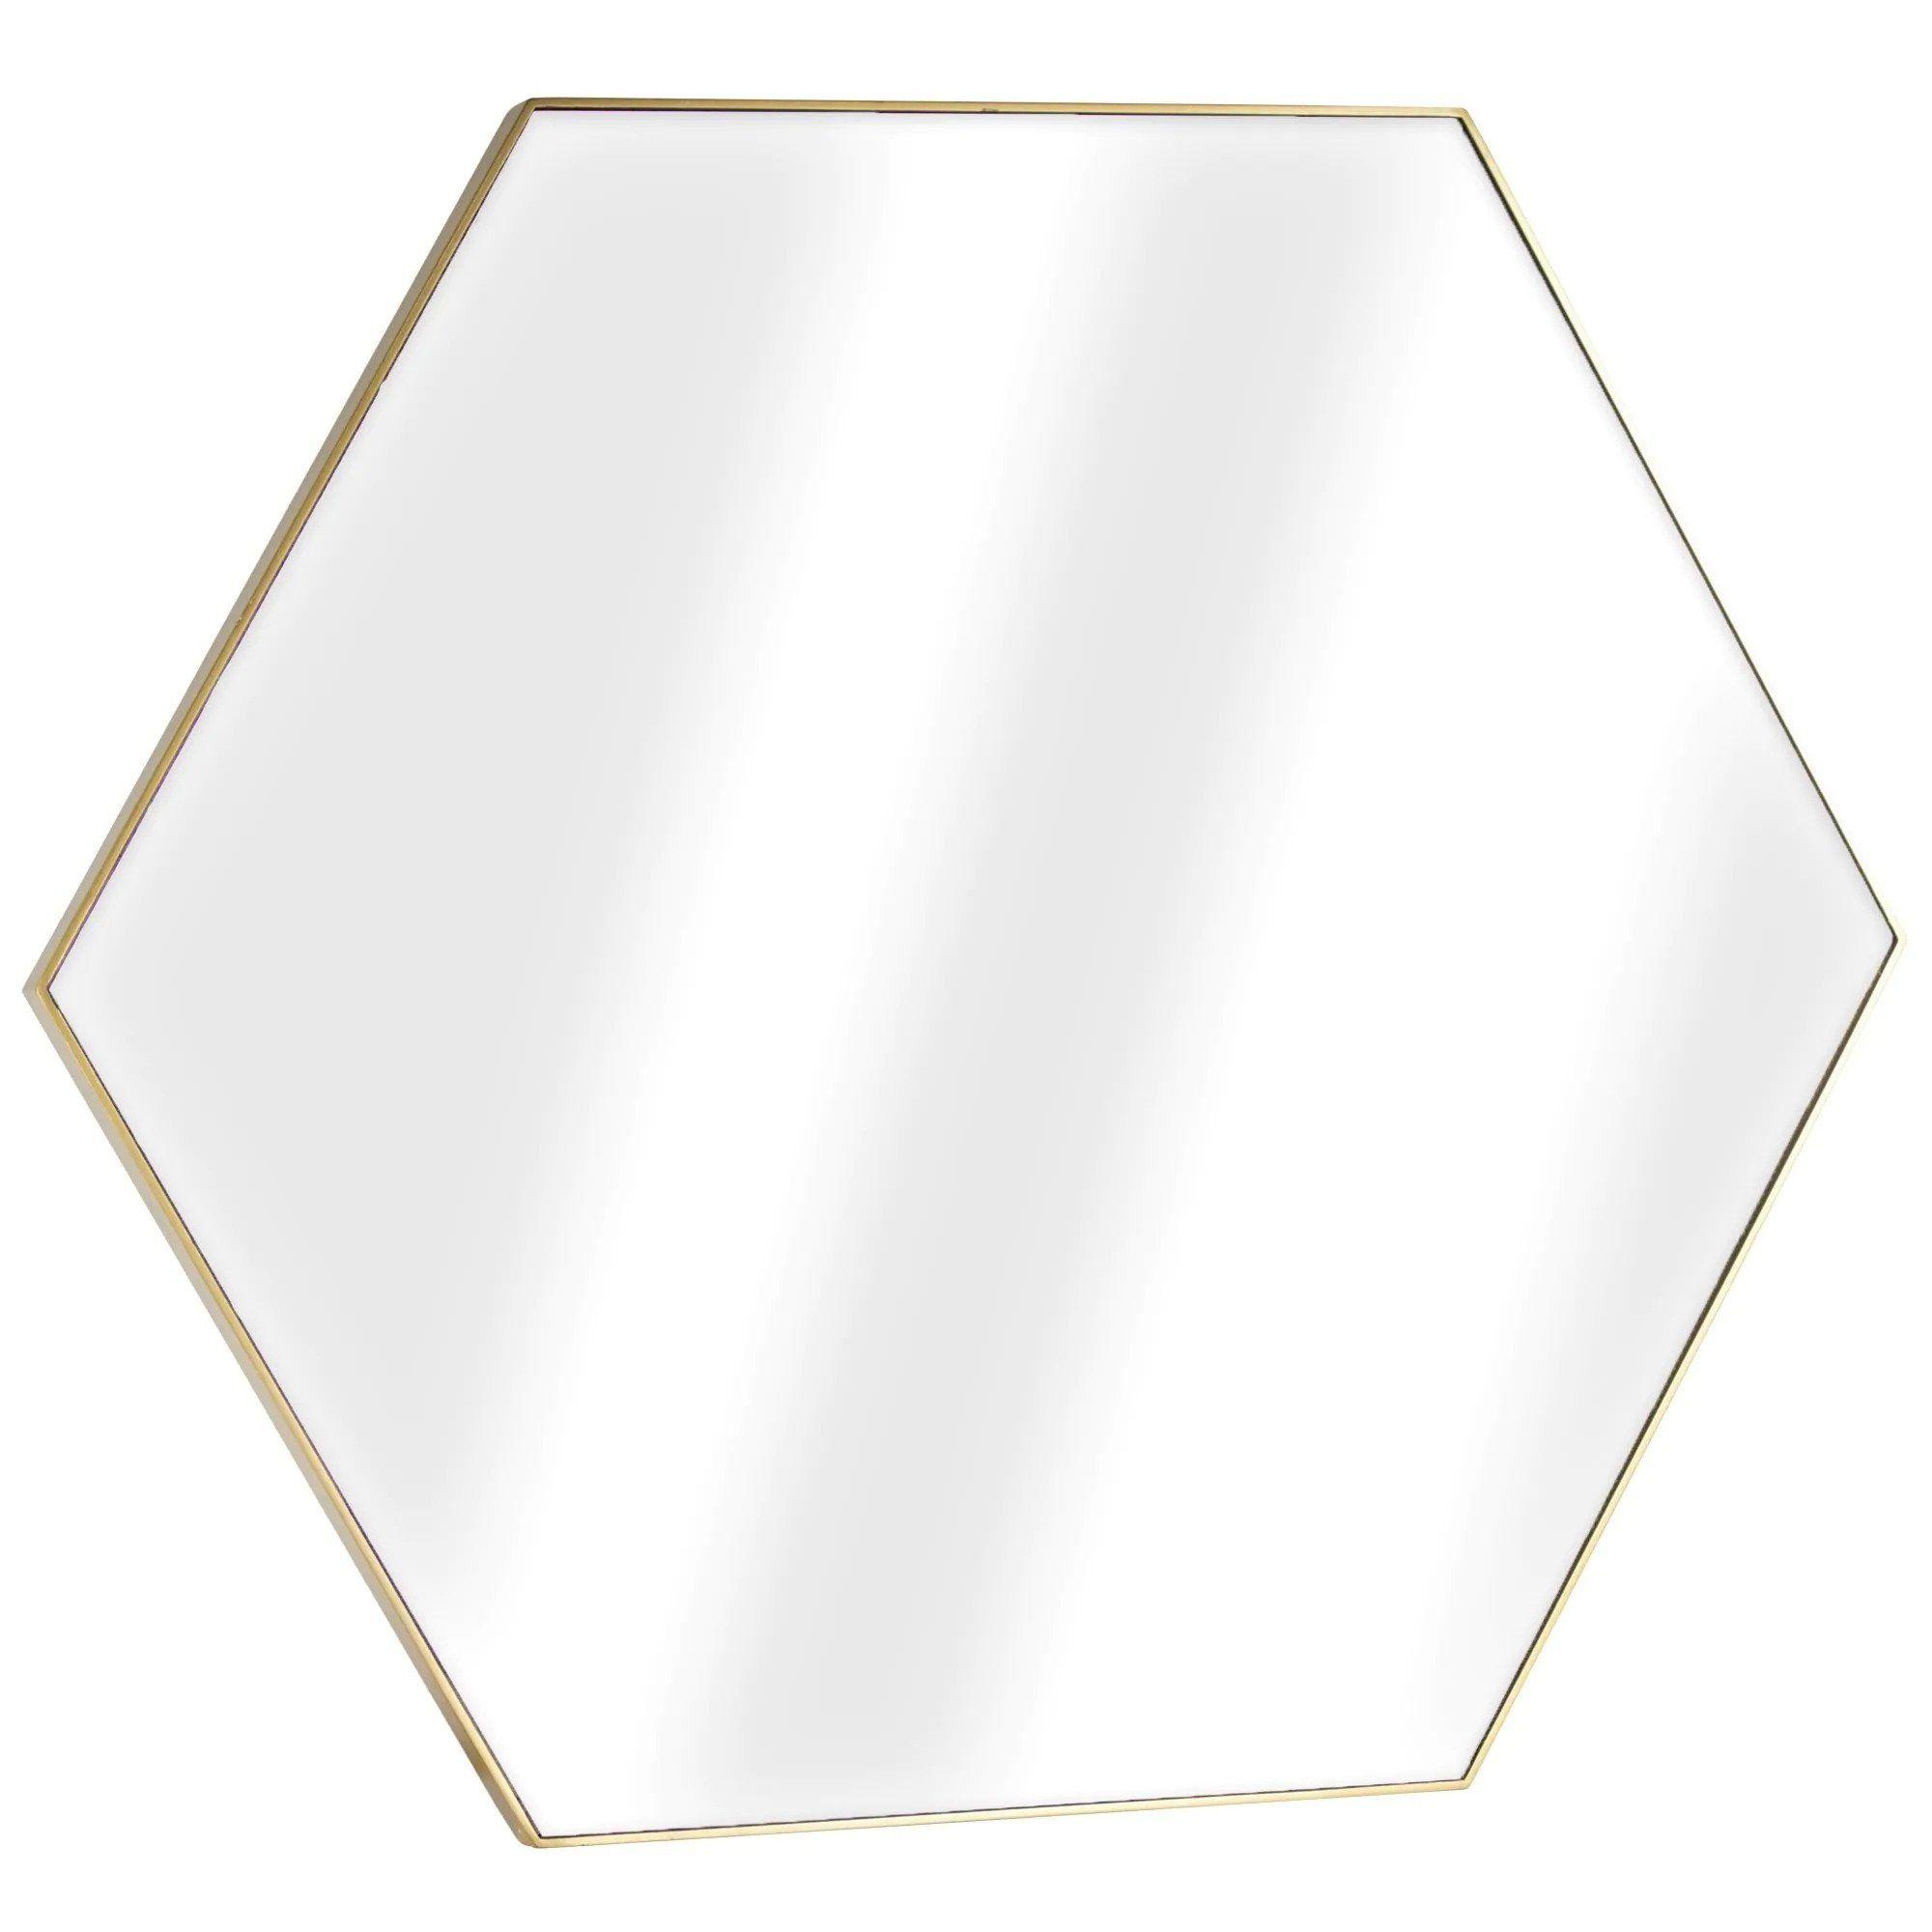 Hexagon Mirror—Entryway